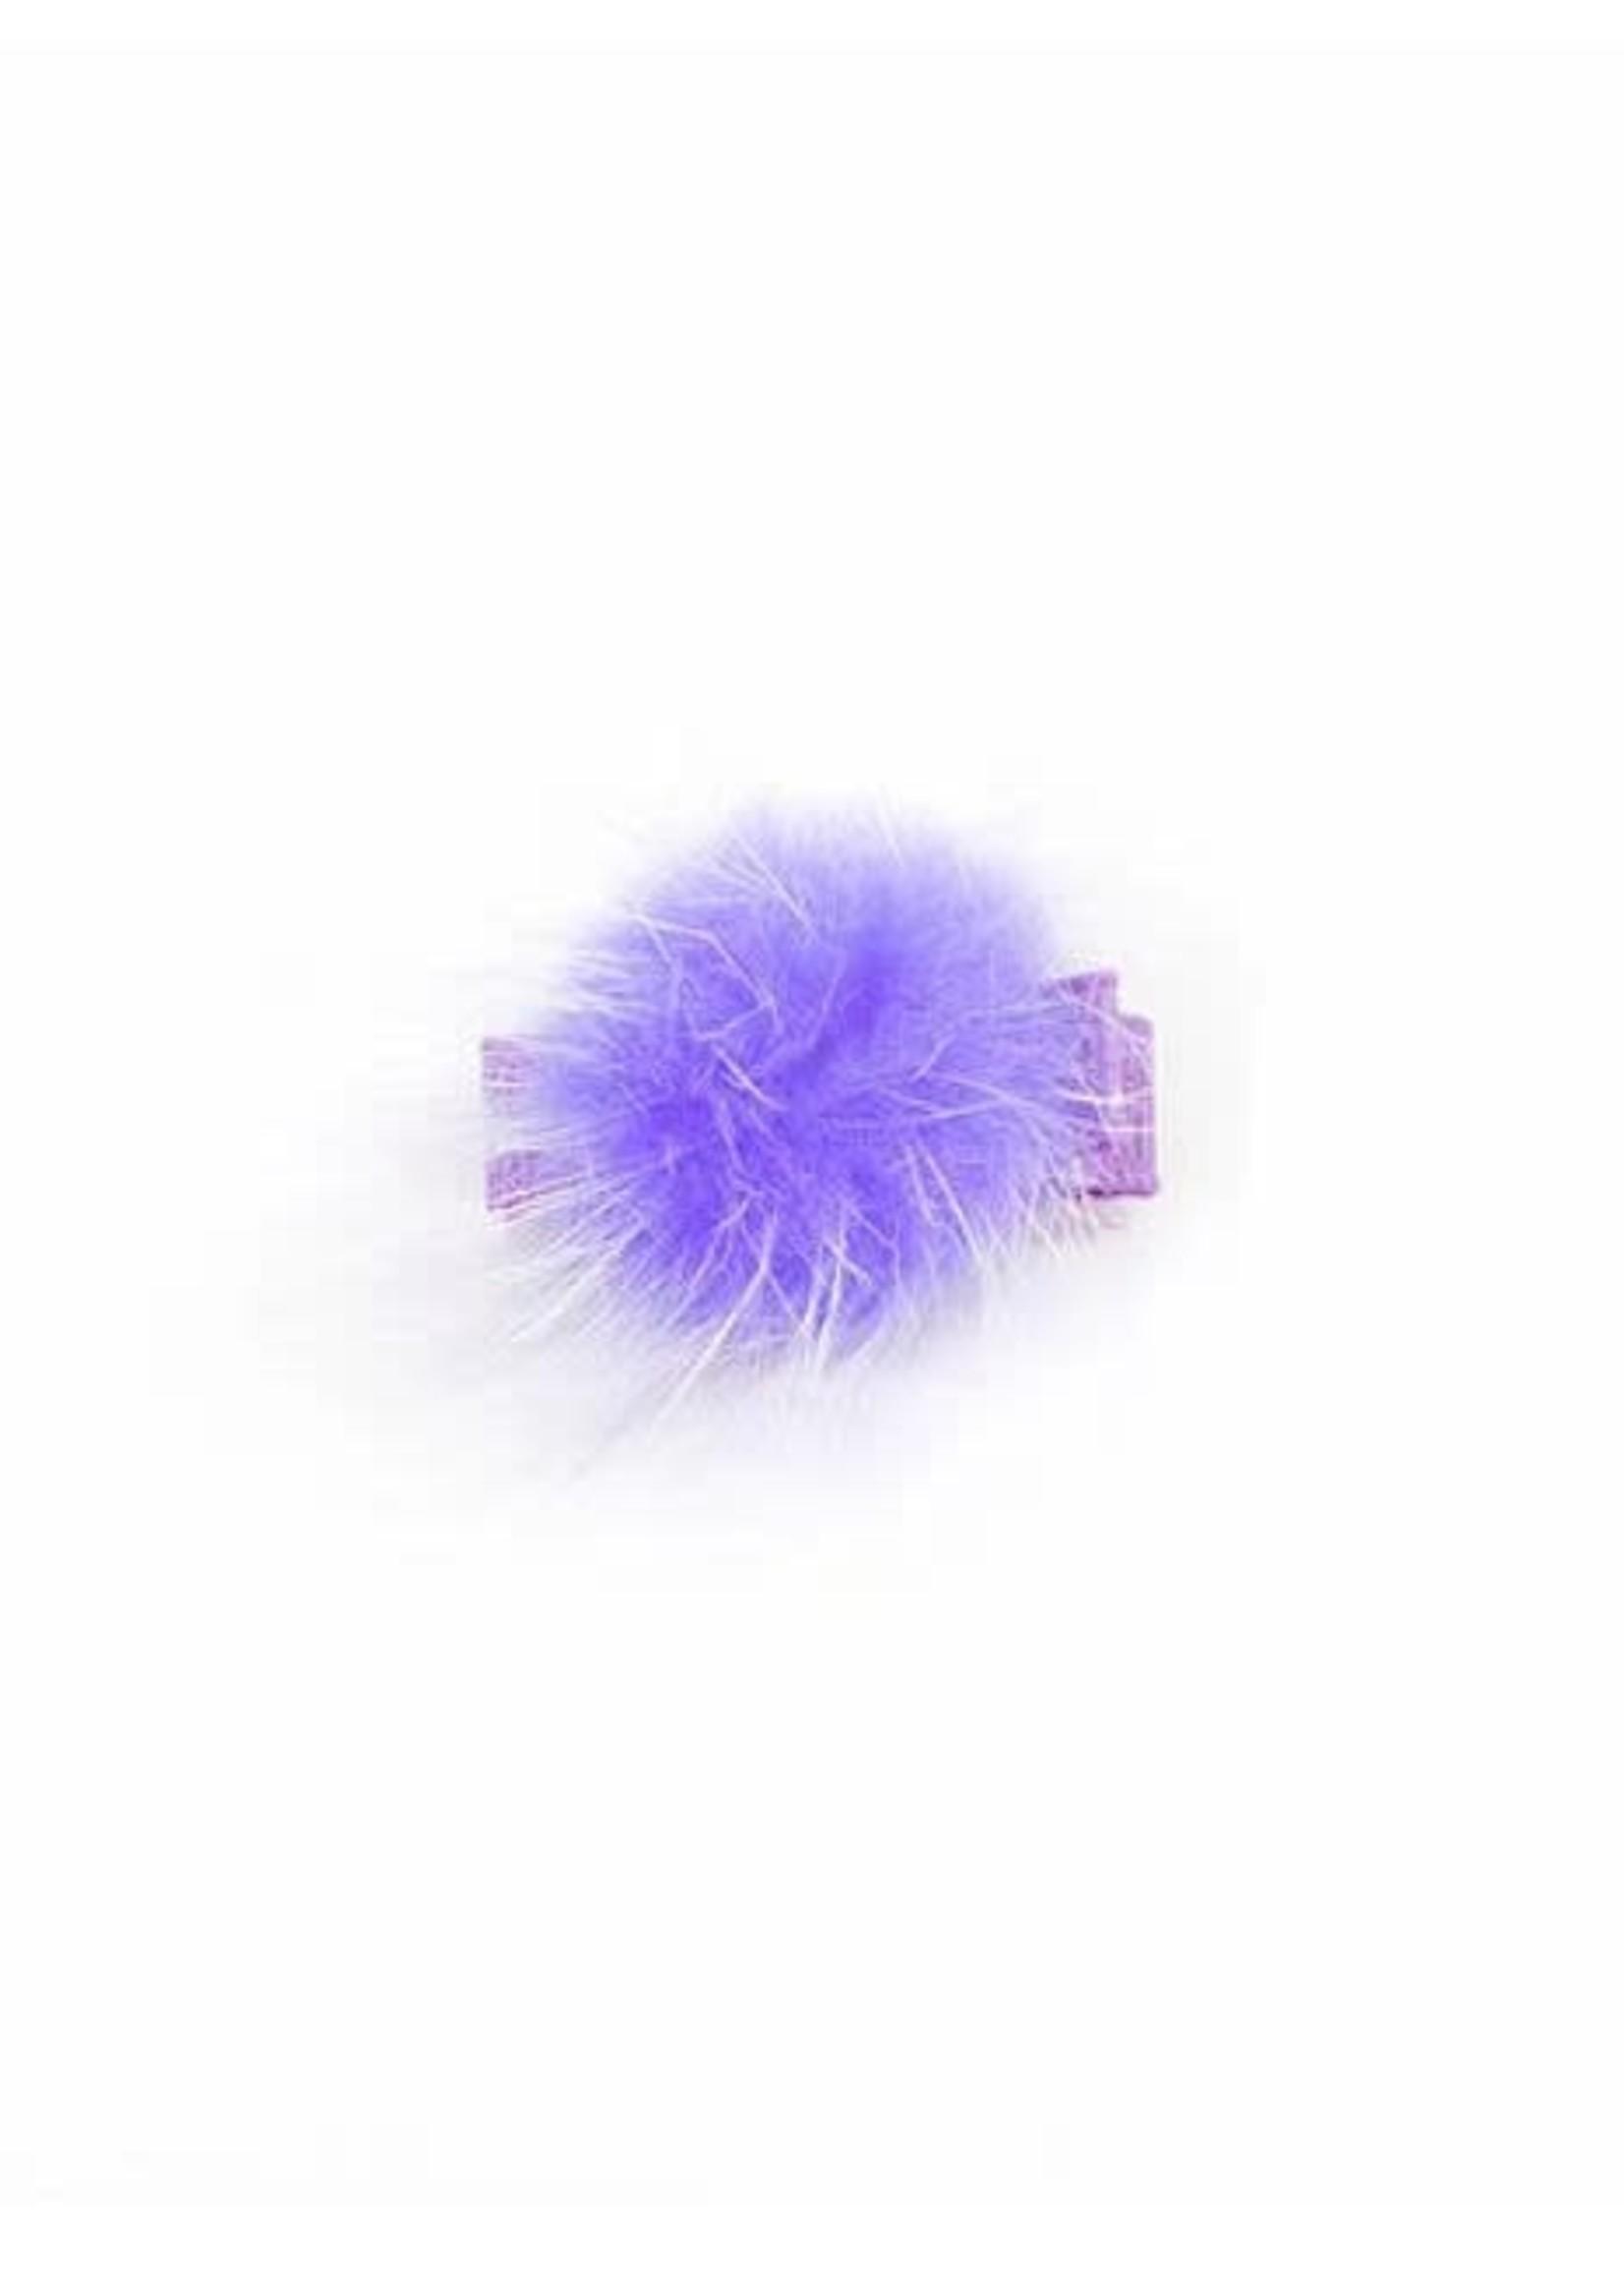 olilia Olilia Small Mink Puff Hair Clip - Purple